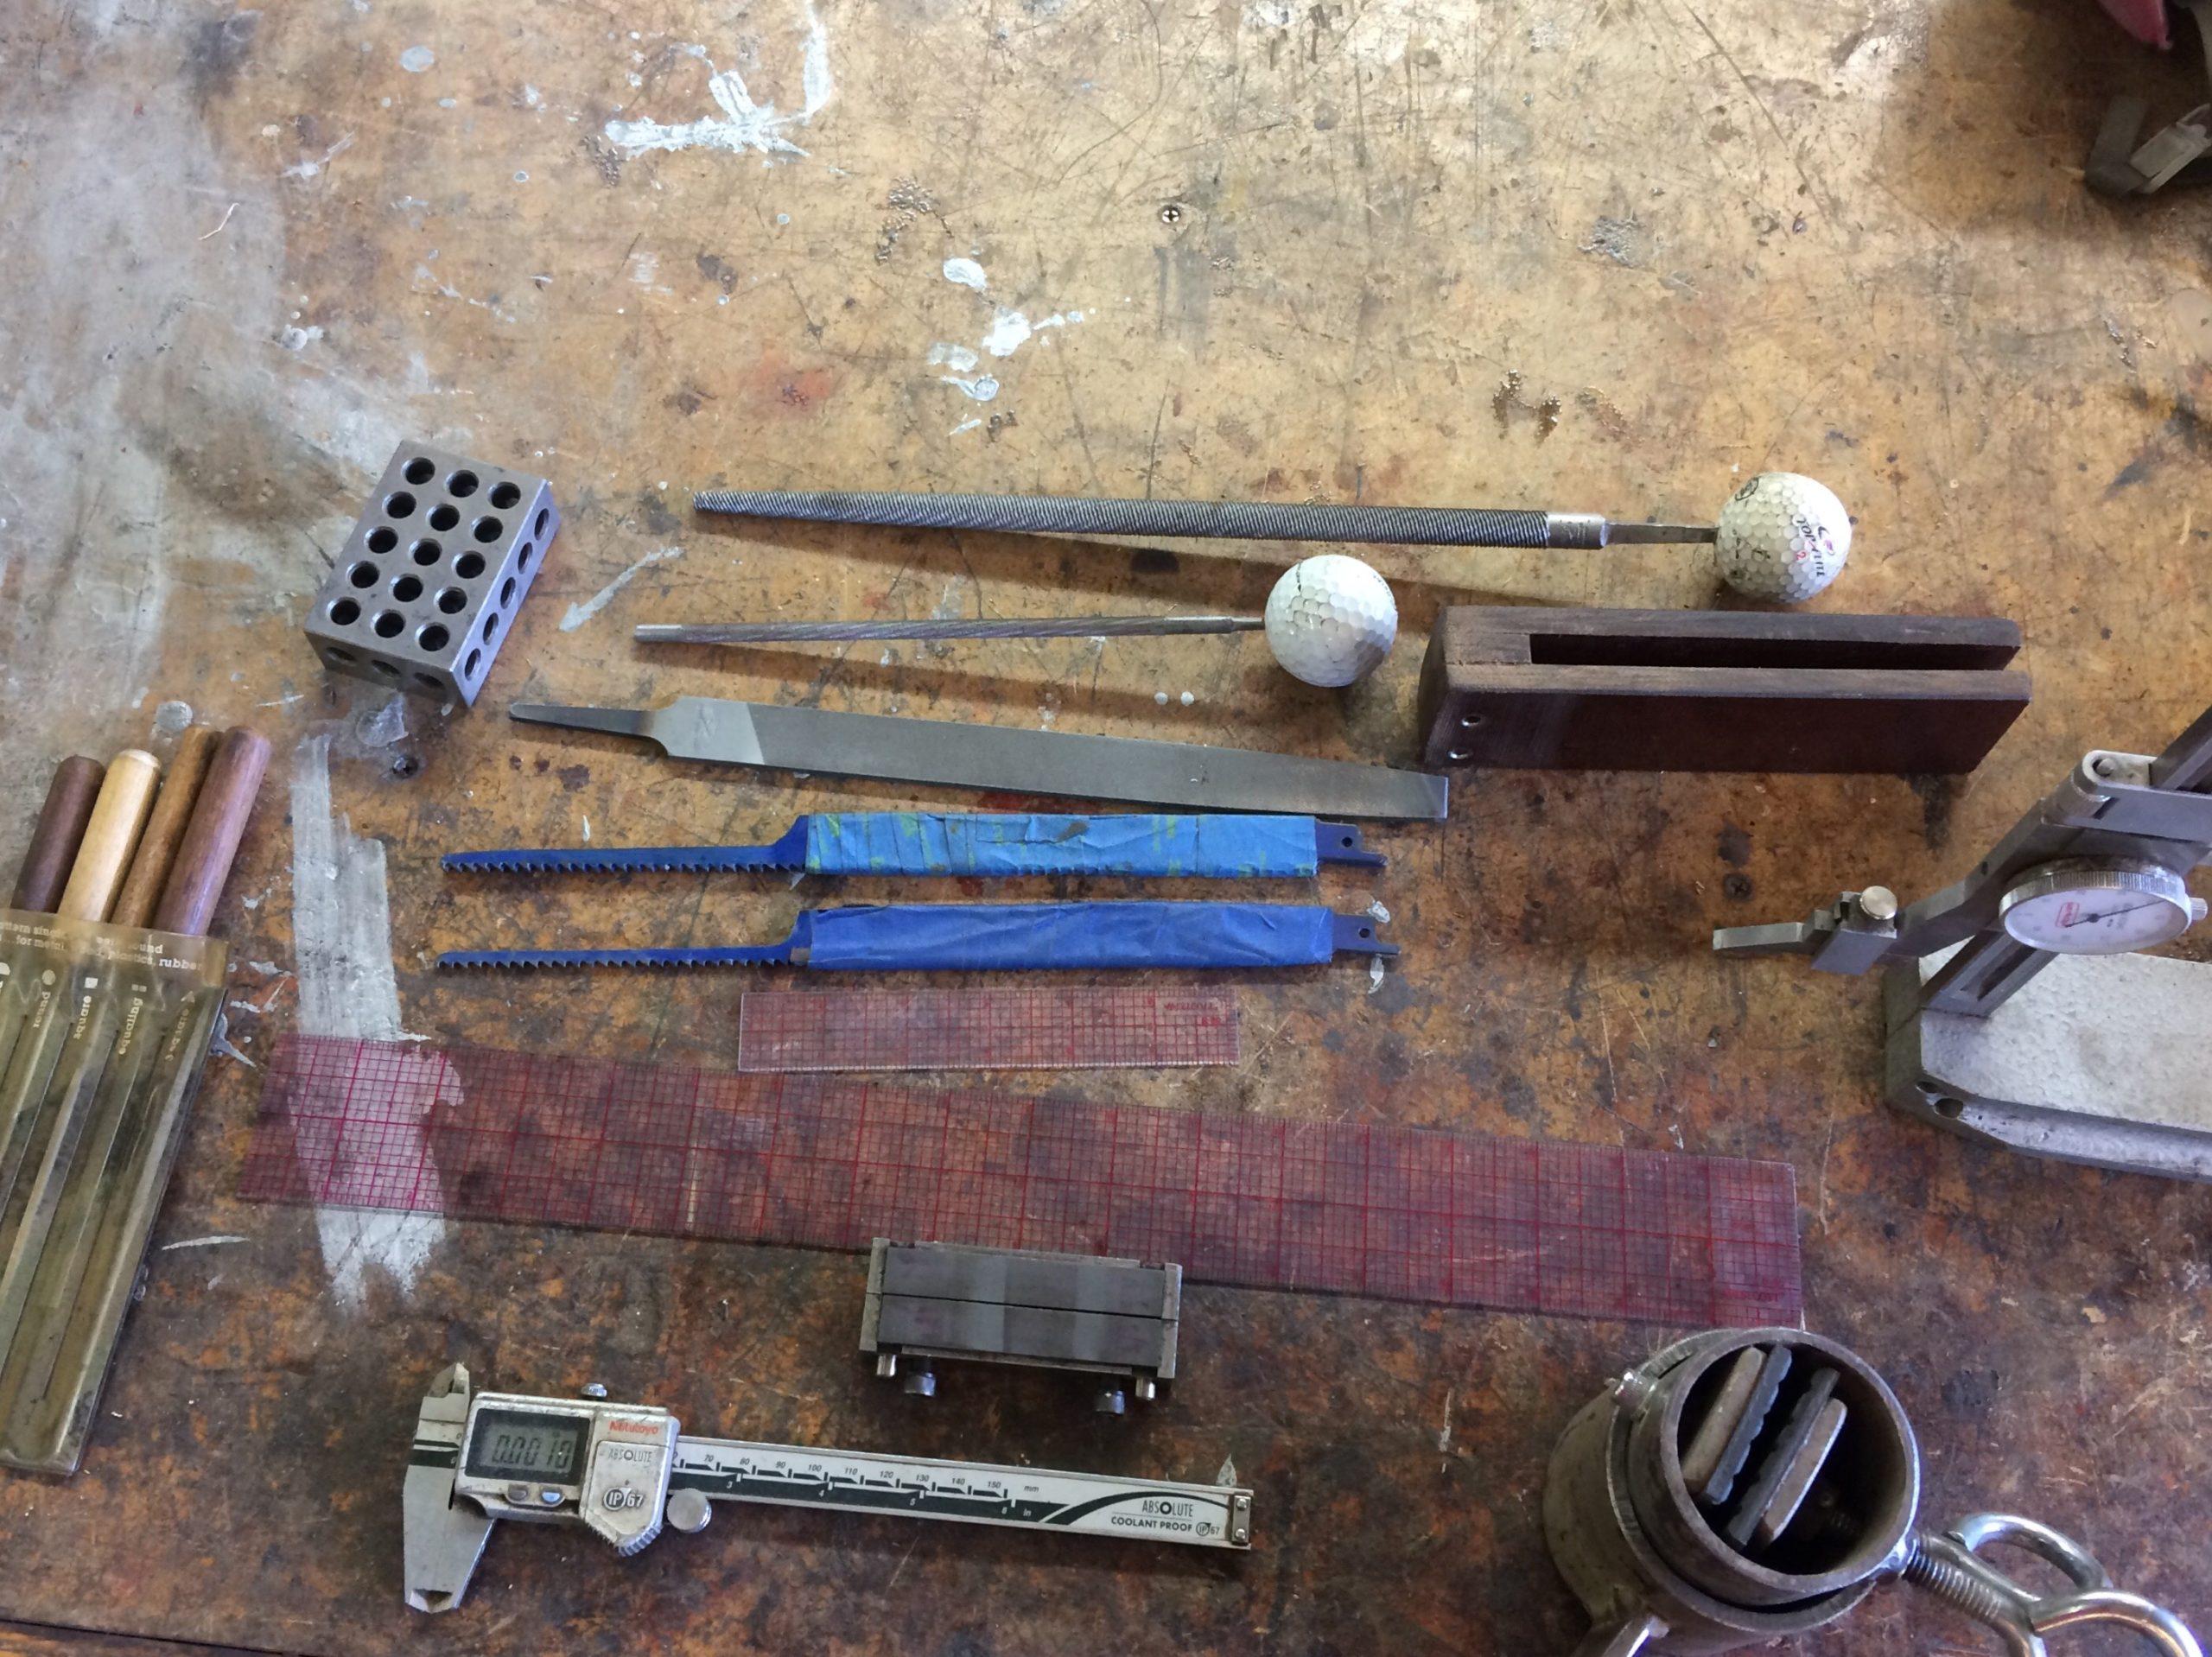 Intermediate Knifemaking/Handles and Guards